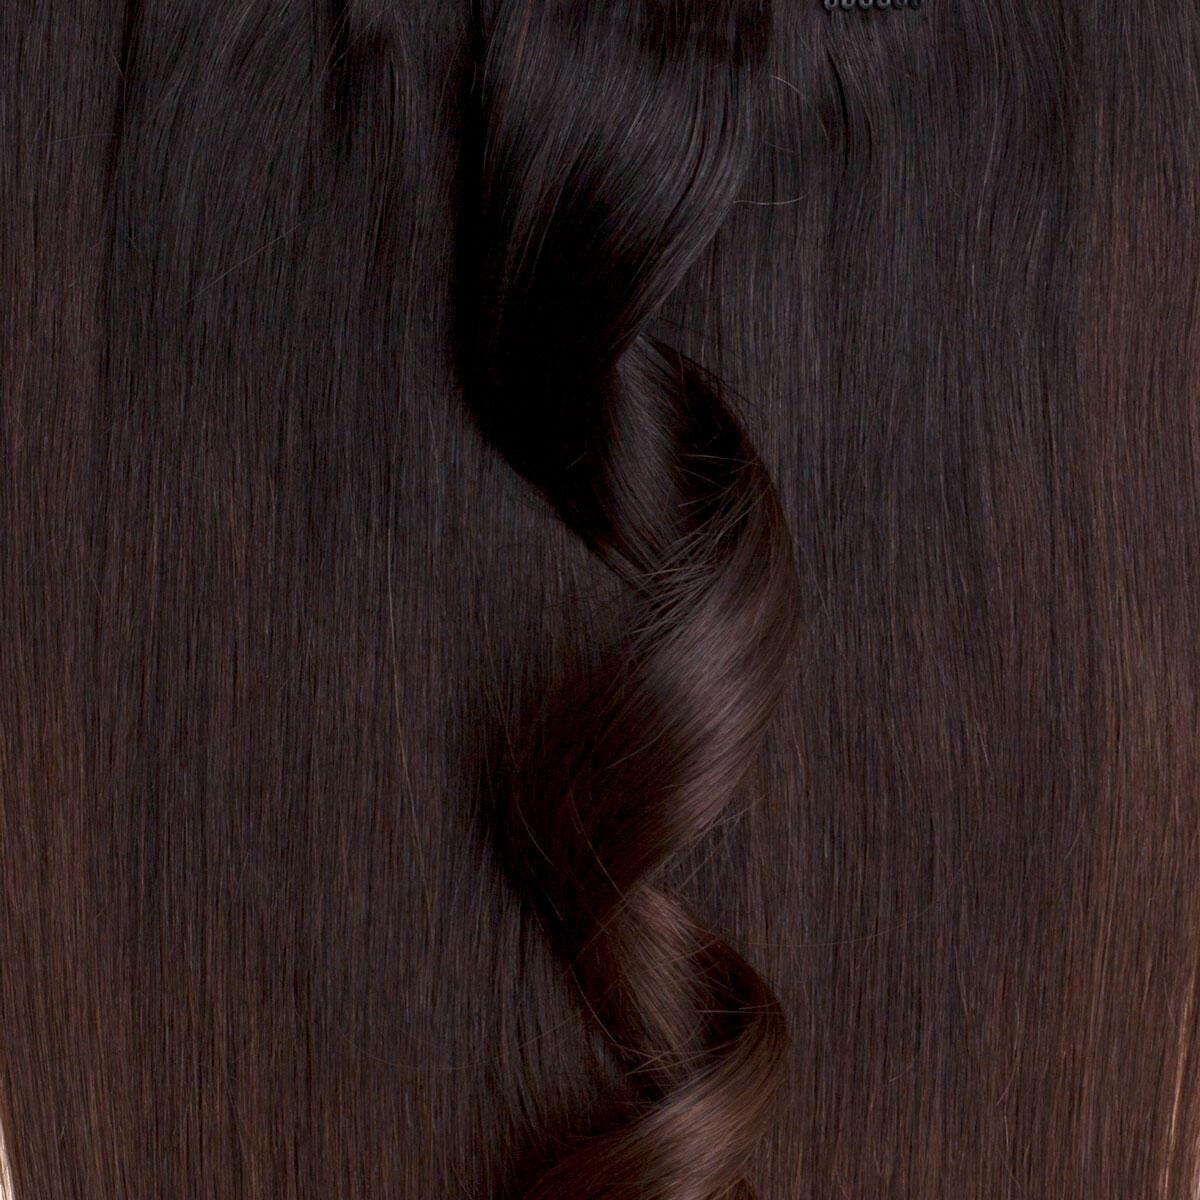 Nail Hair Original O1.2/2.0 Black Brown Ombre 40 cm